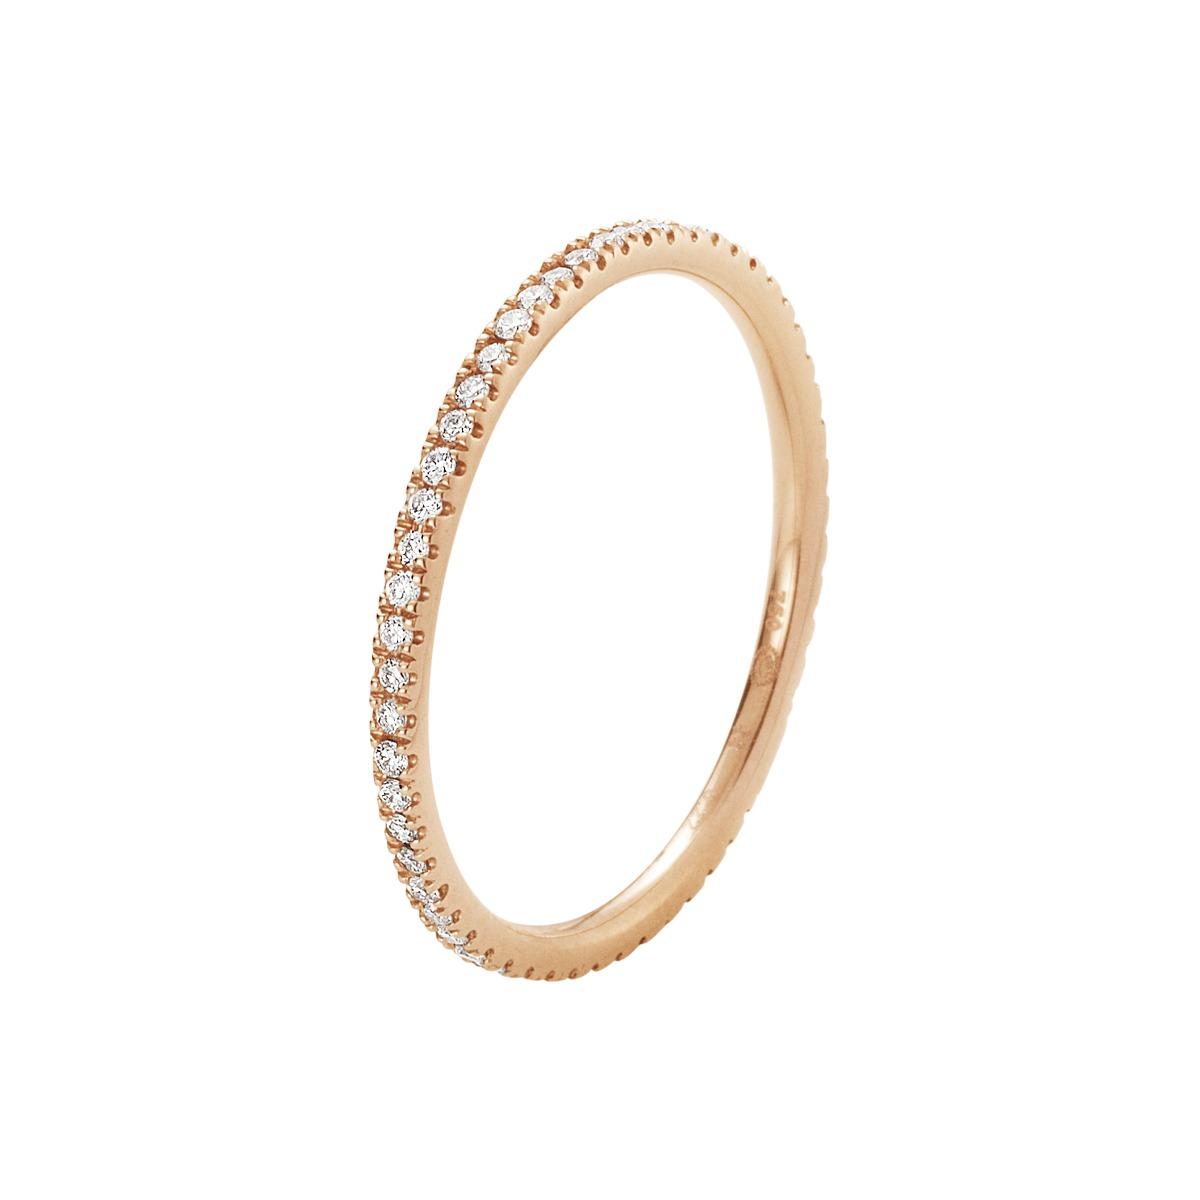 Image of   Georg Jensen CLASSIQUE ring - 3571540 Størrelse 54